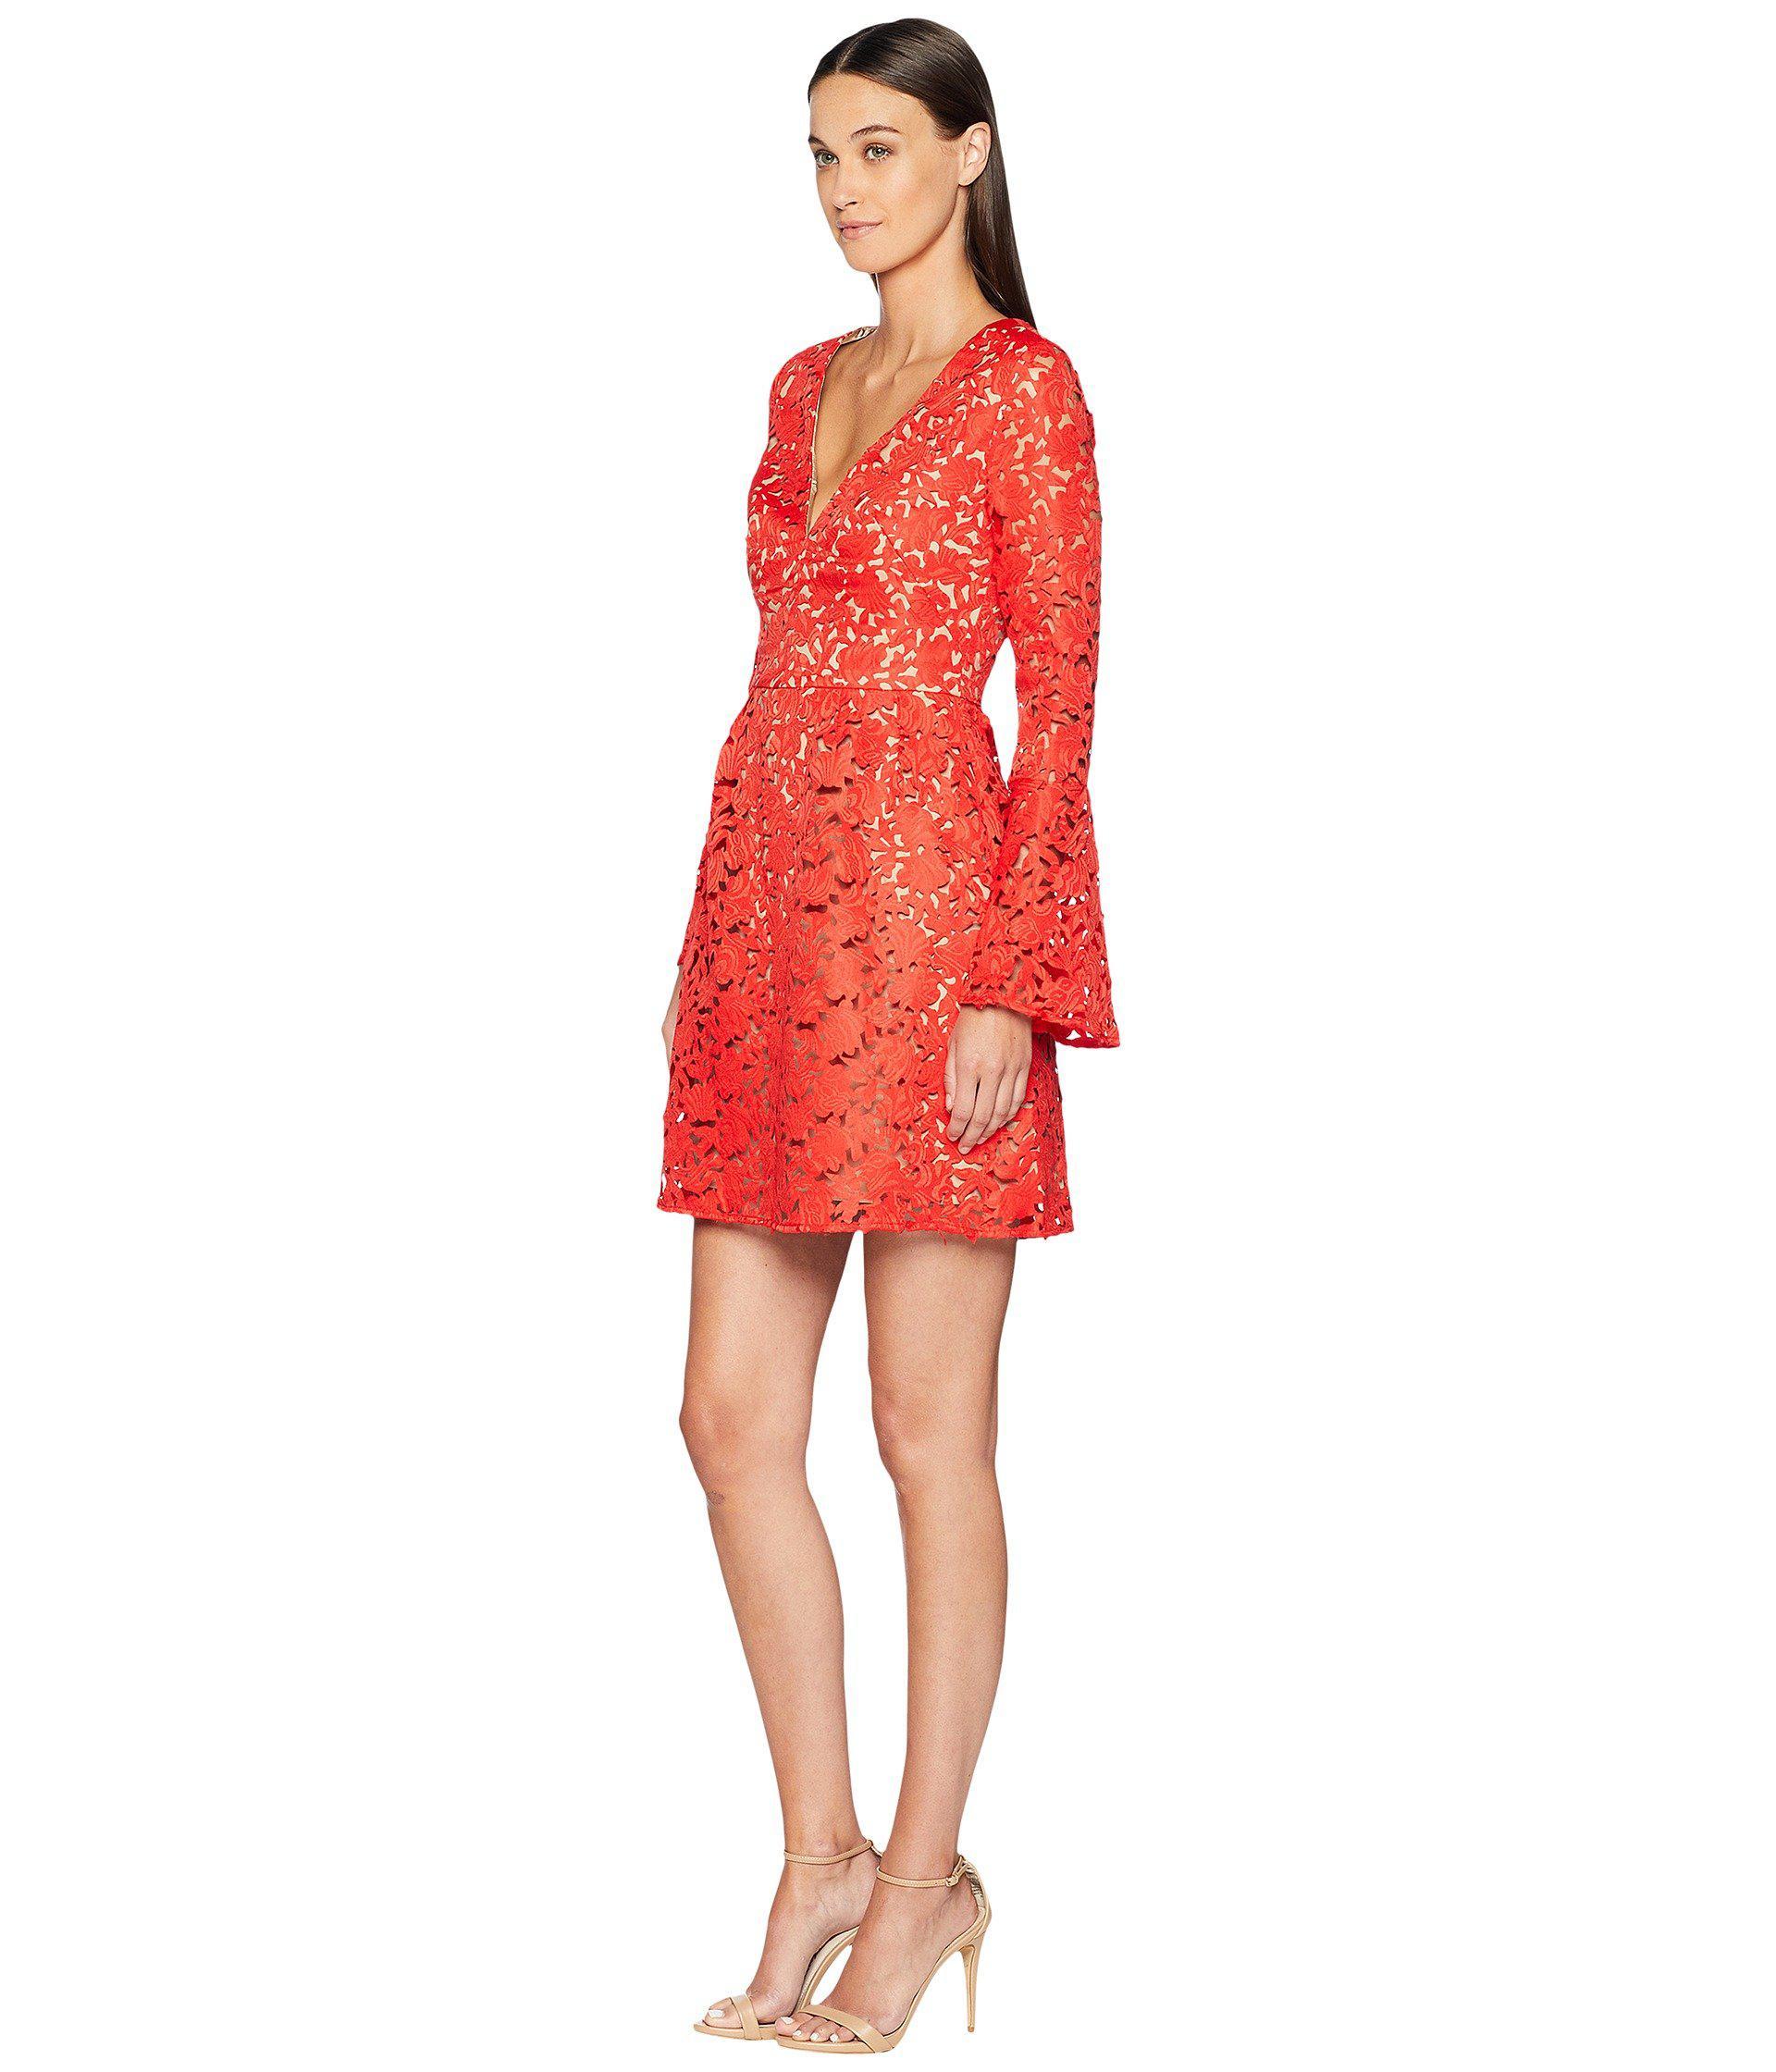 e4fd2ec79c8 ML Monique Lhuillier Laser Cut Bell Sleeve Dress (sangria) Women s Dress in  Red - Lyst